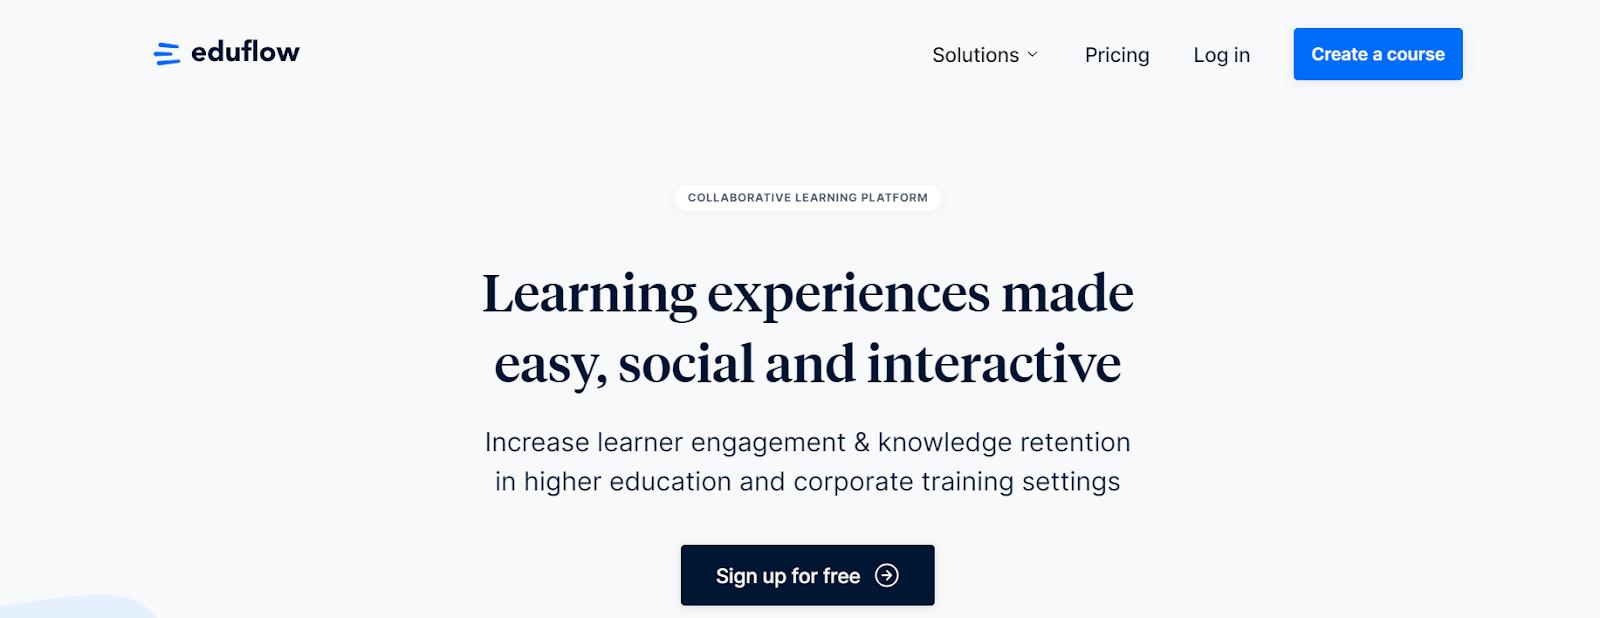 Screenshot of Eduflow - Cohort Based Course Platform